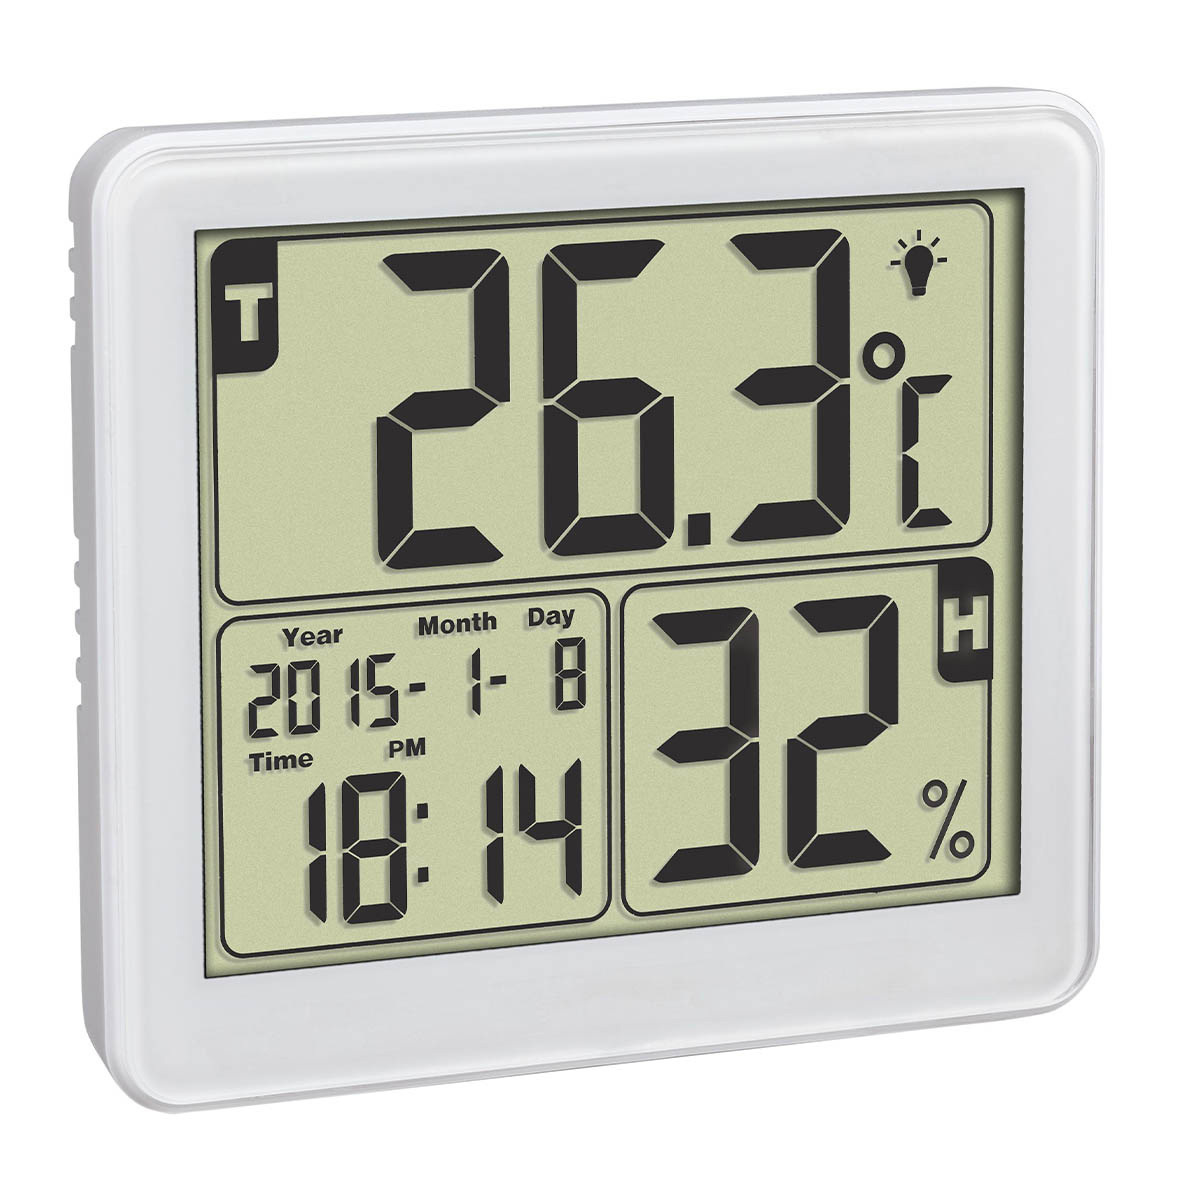 30-5042-02-digitales-thermo-hygrometer-1200x1200px.jpg